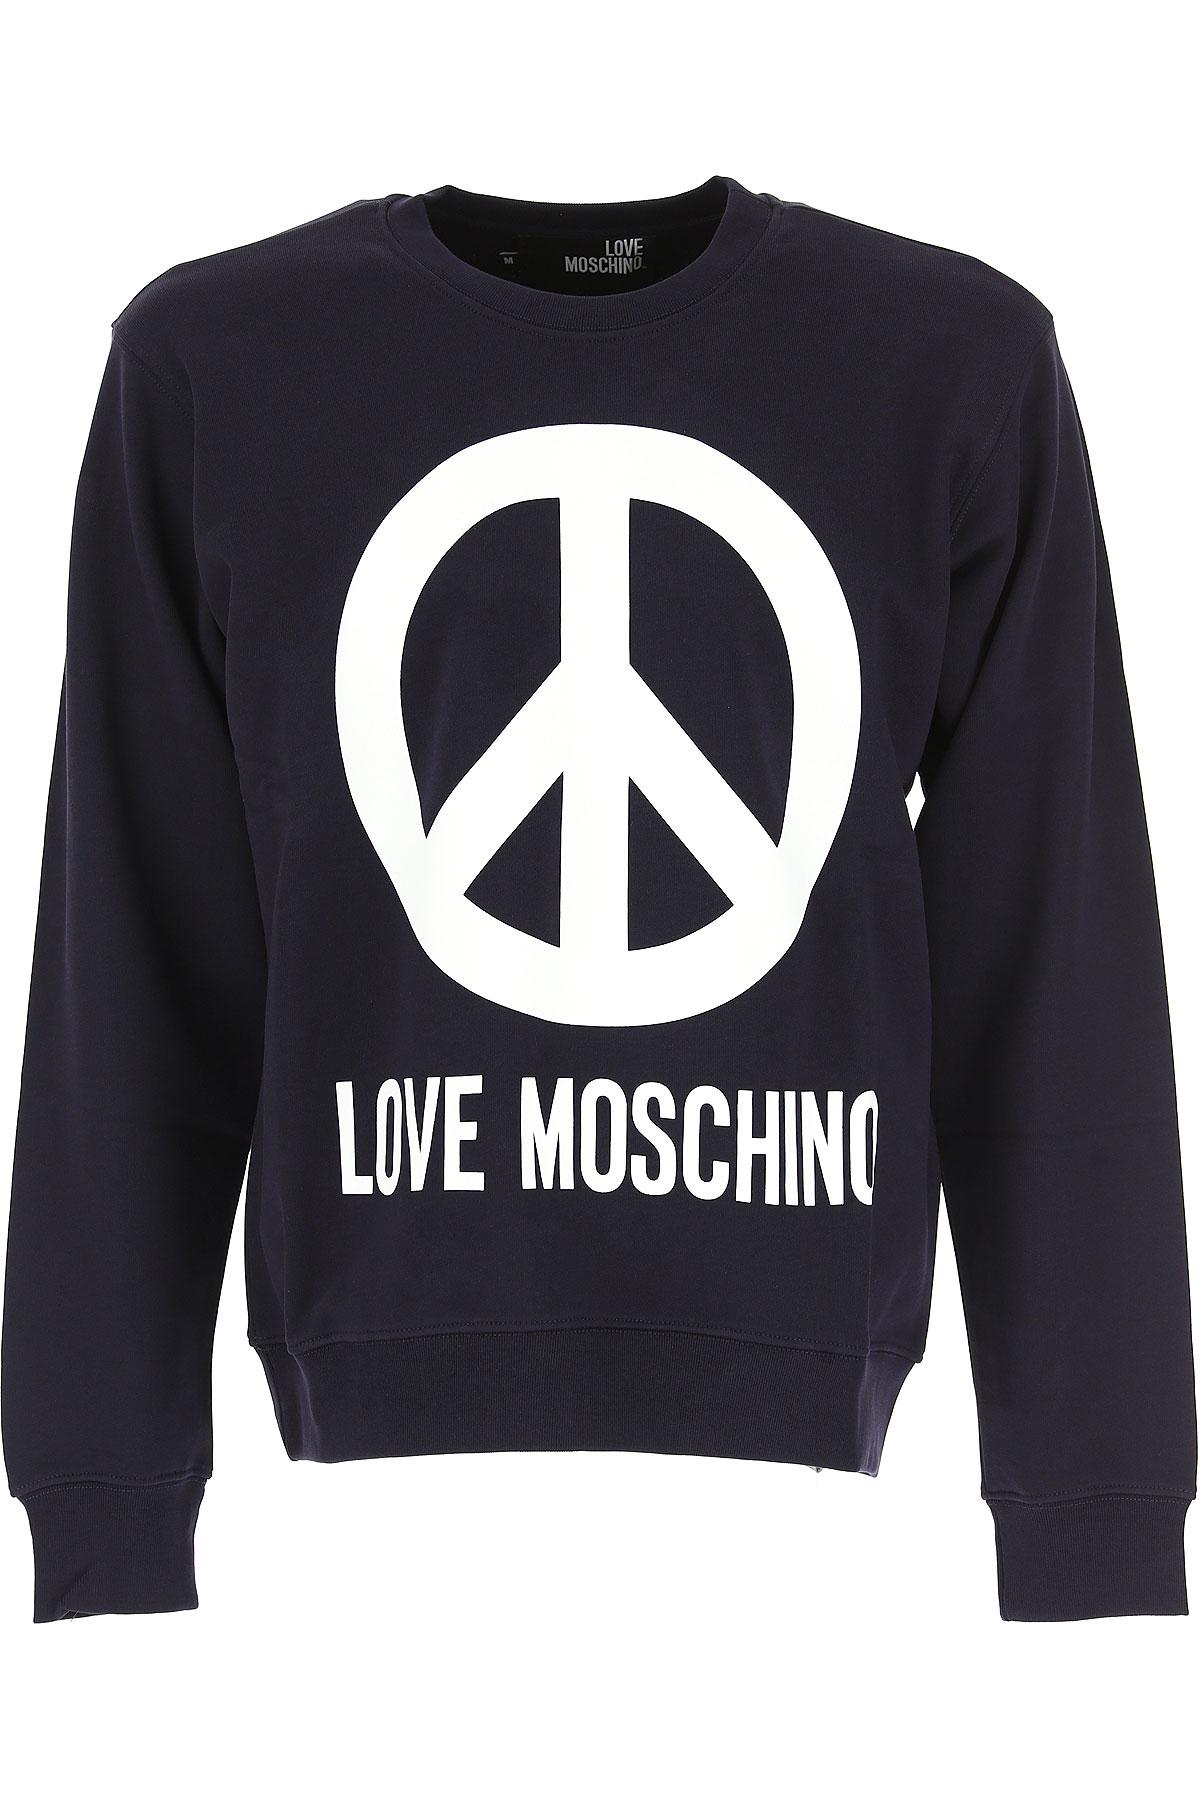 Moschino Sweatshirt for Men, Navy Blue, Cotton, 2017, L M S XL XS USA-468292